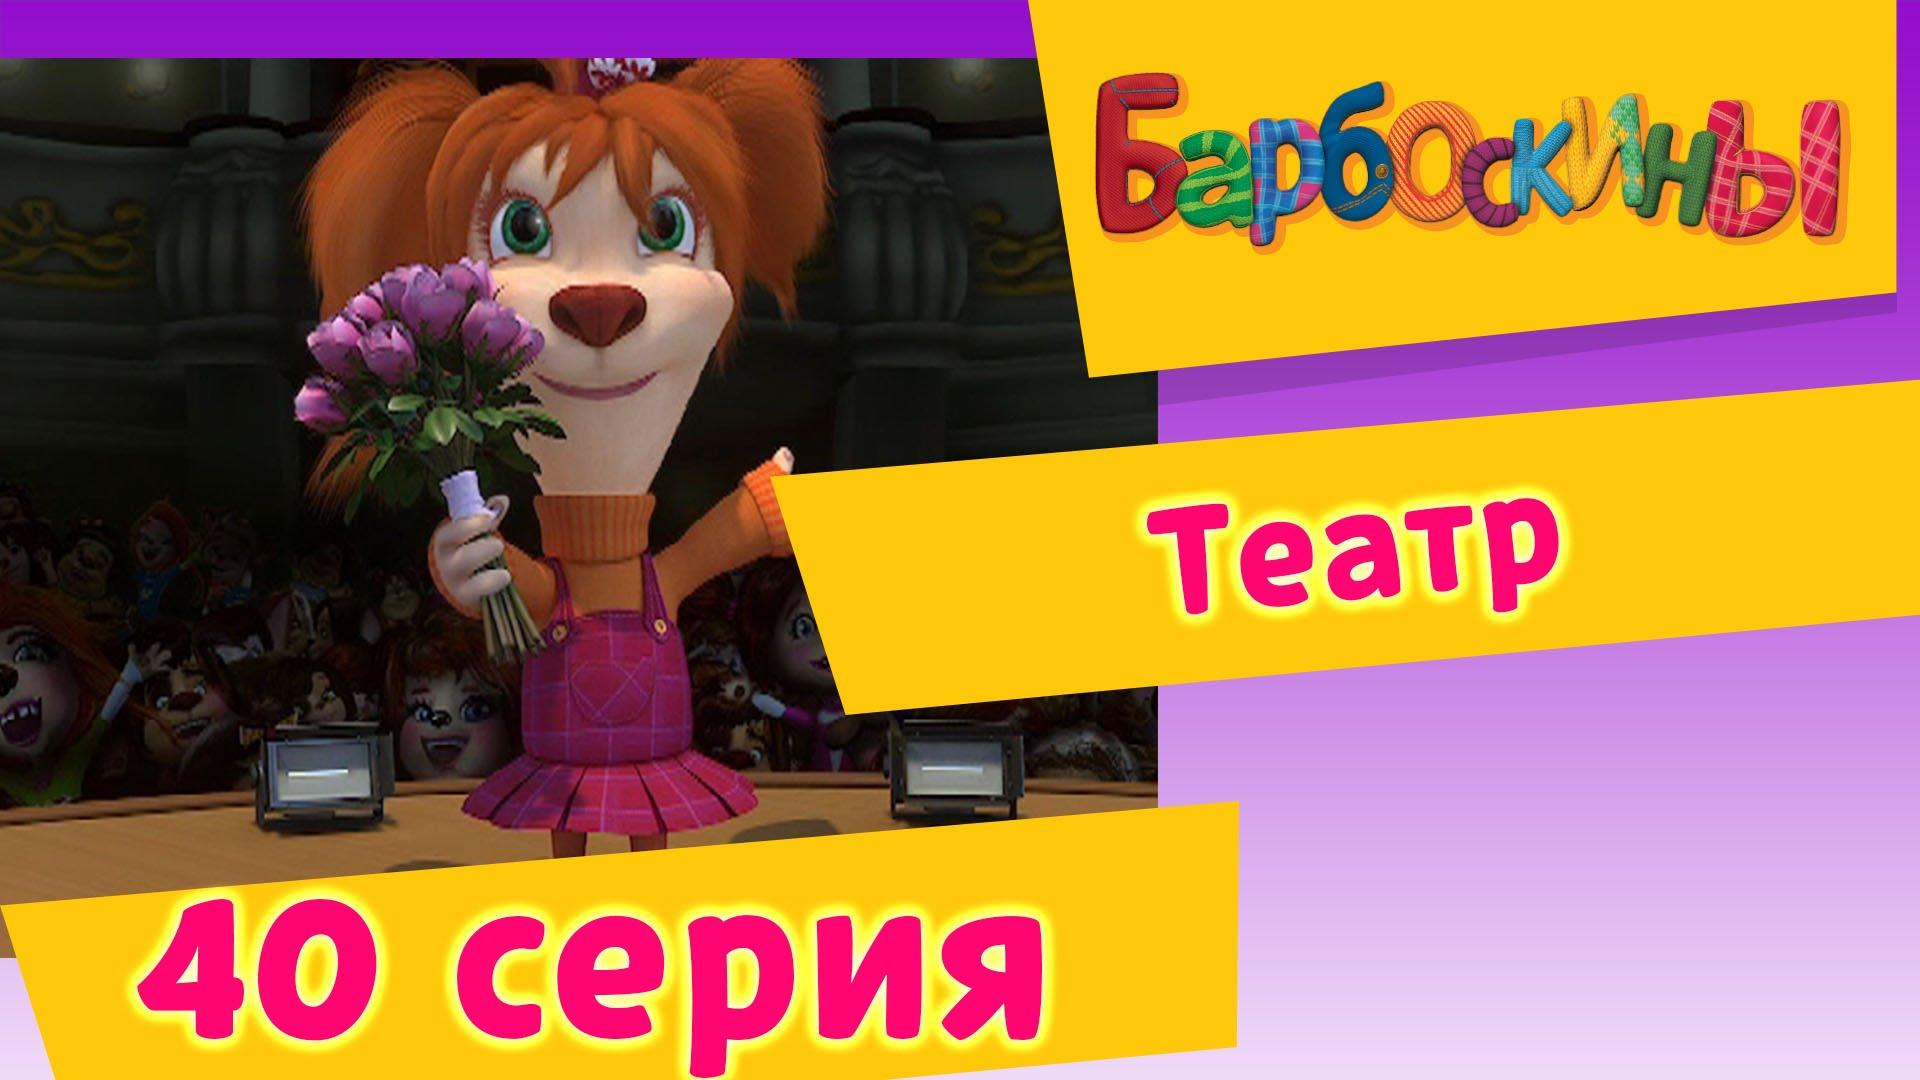 Барбоскины — 40 Серия. Театр